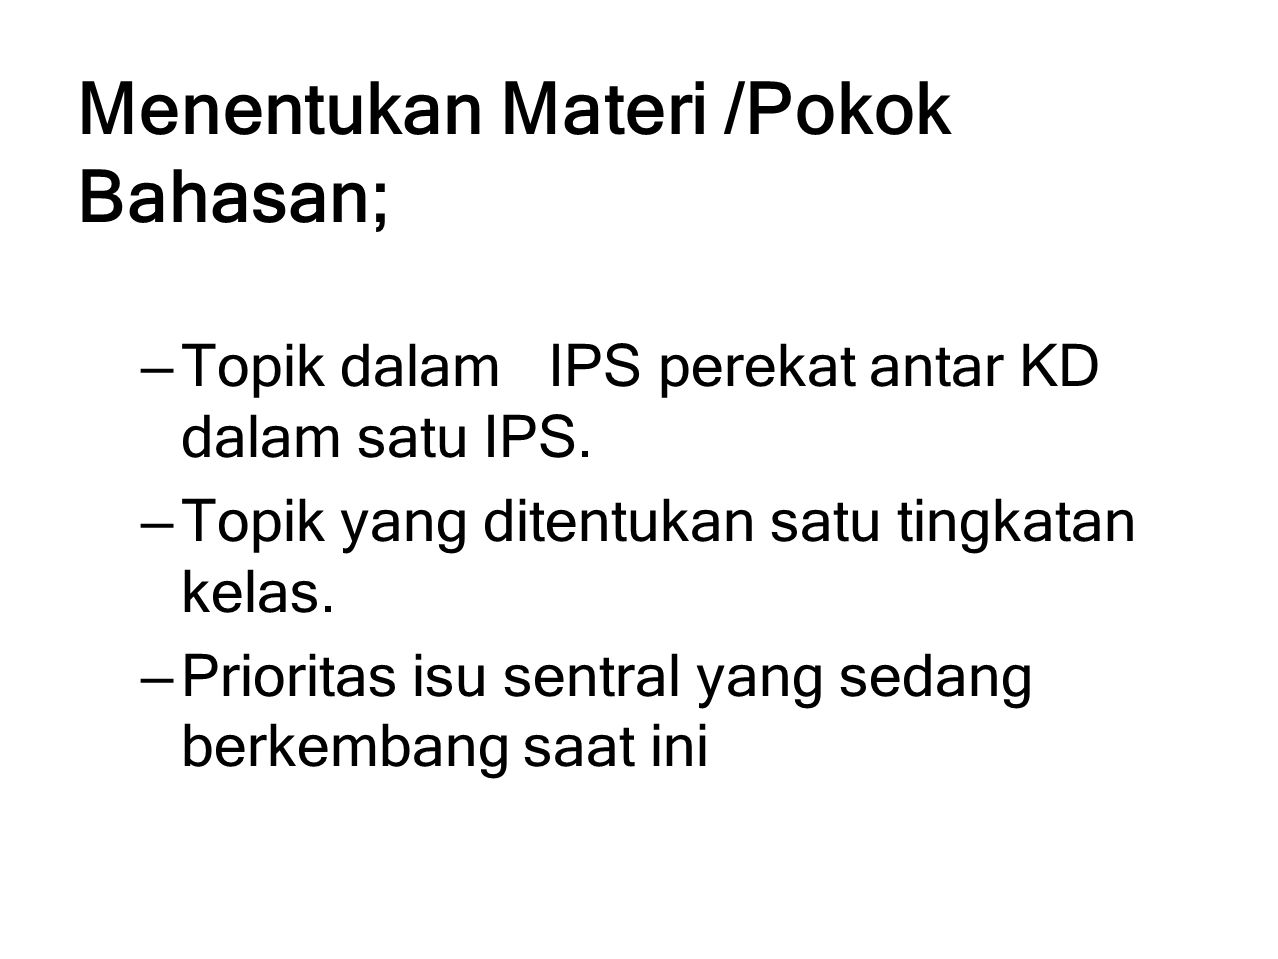 Menentukan Materi /Pokok Bahasan; – Topik dalam IPS perekat antar KD dalam satu IPS. – Topik yang ditentukan satu tingkatan kelas. – Prioritas isu sen